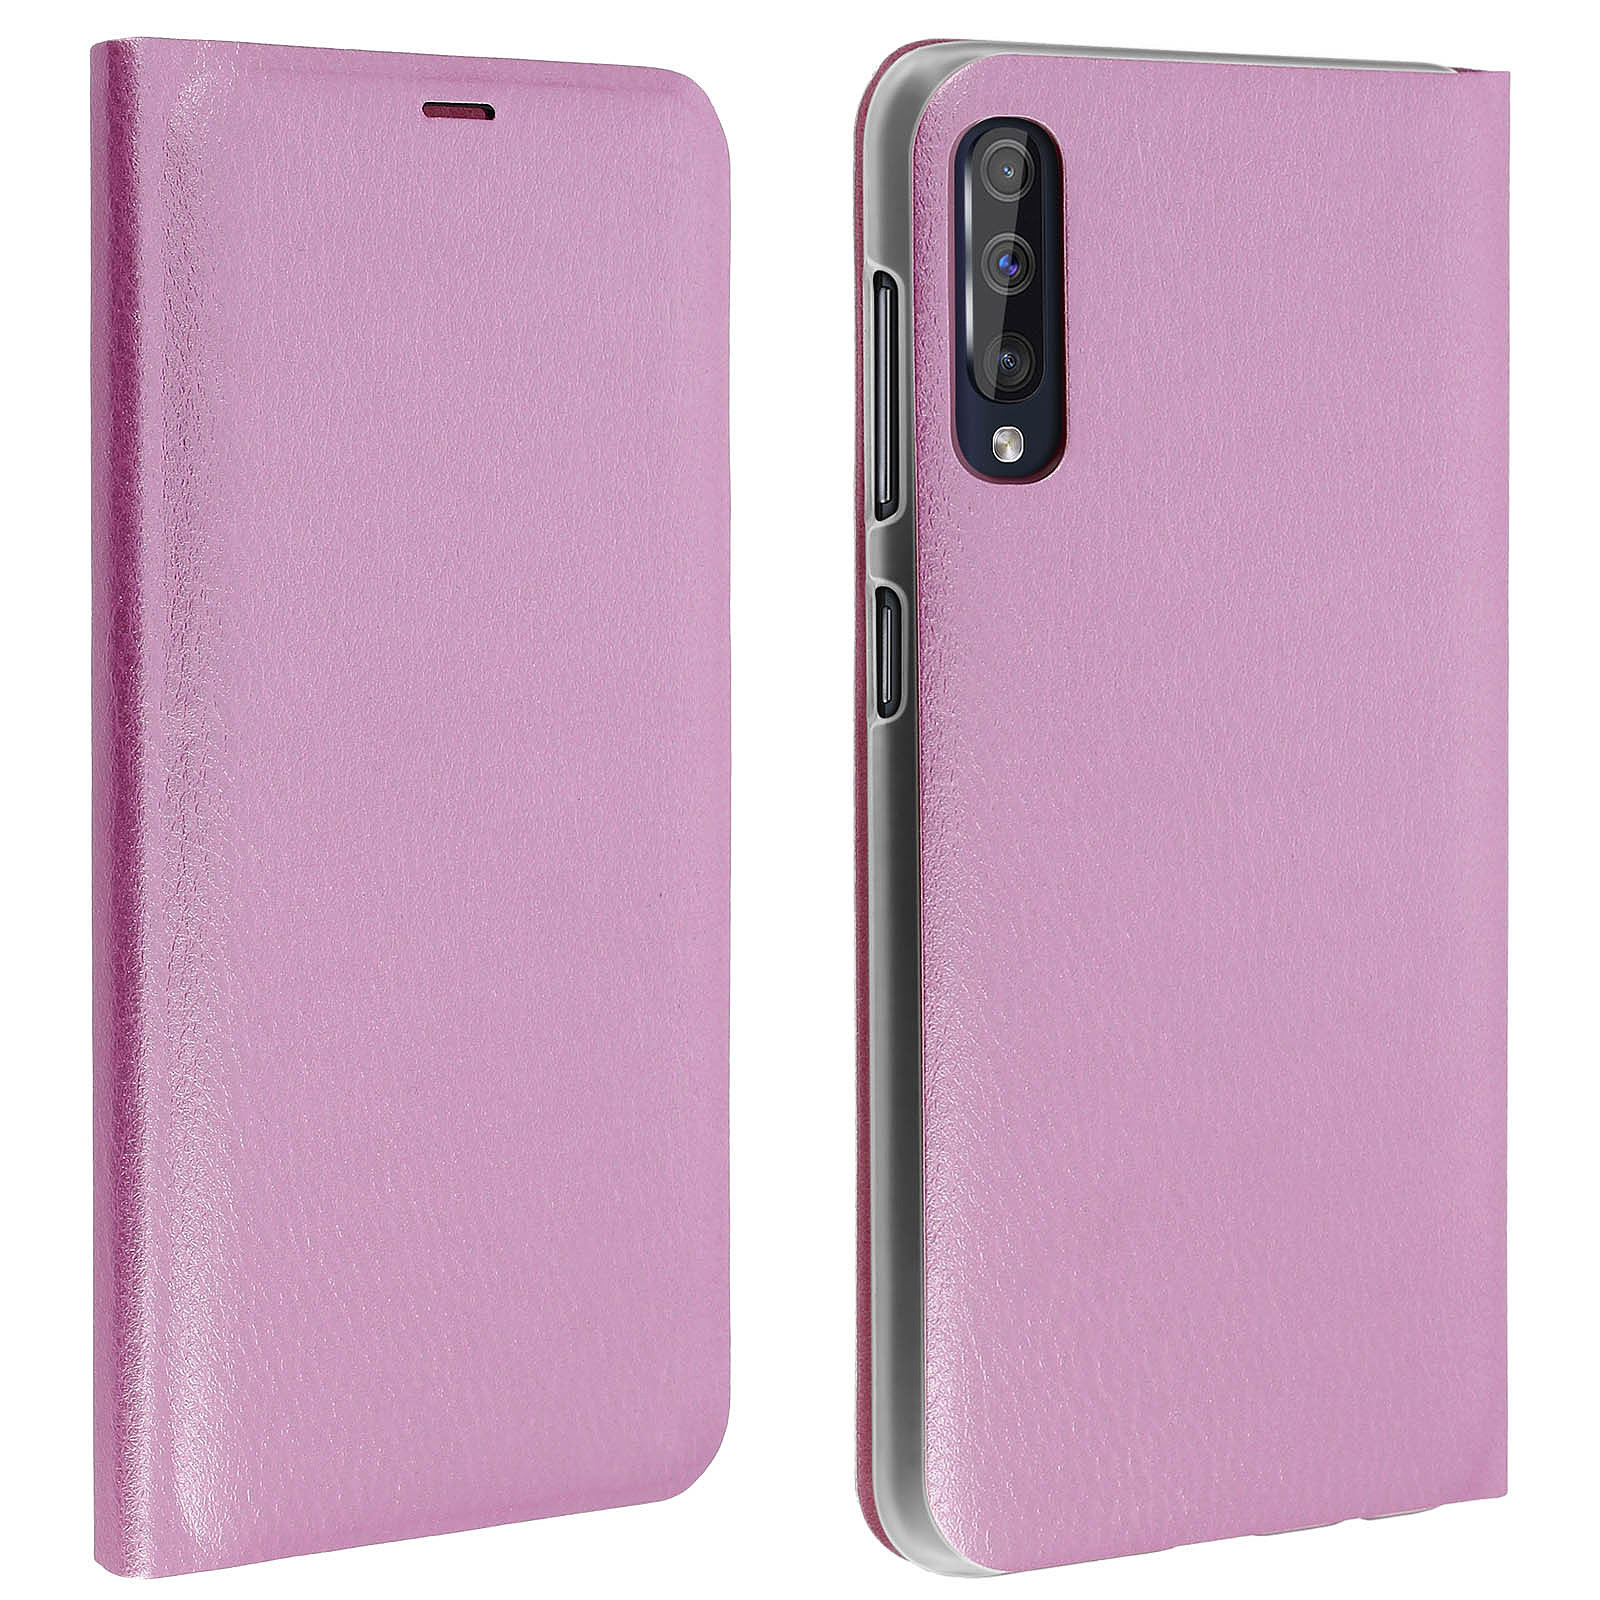 Avizar Etui folio Rose pour Samsung Galaxy A50 , Samsung Galaxy A30s